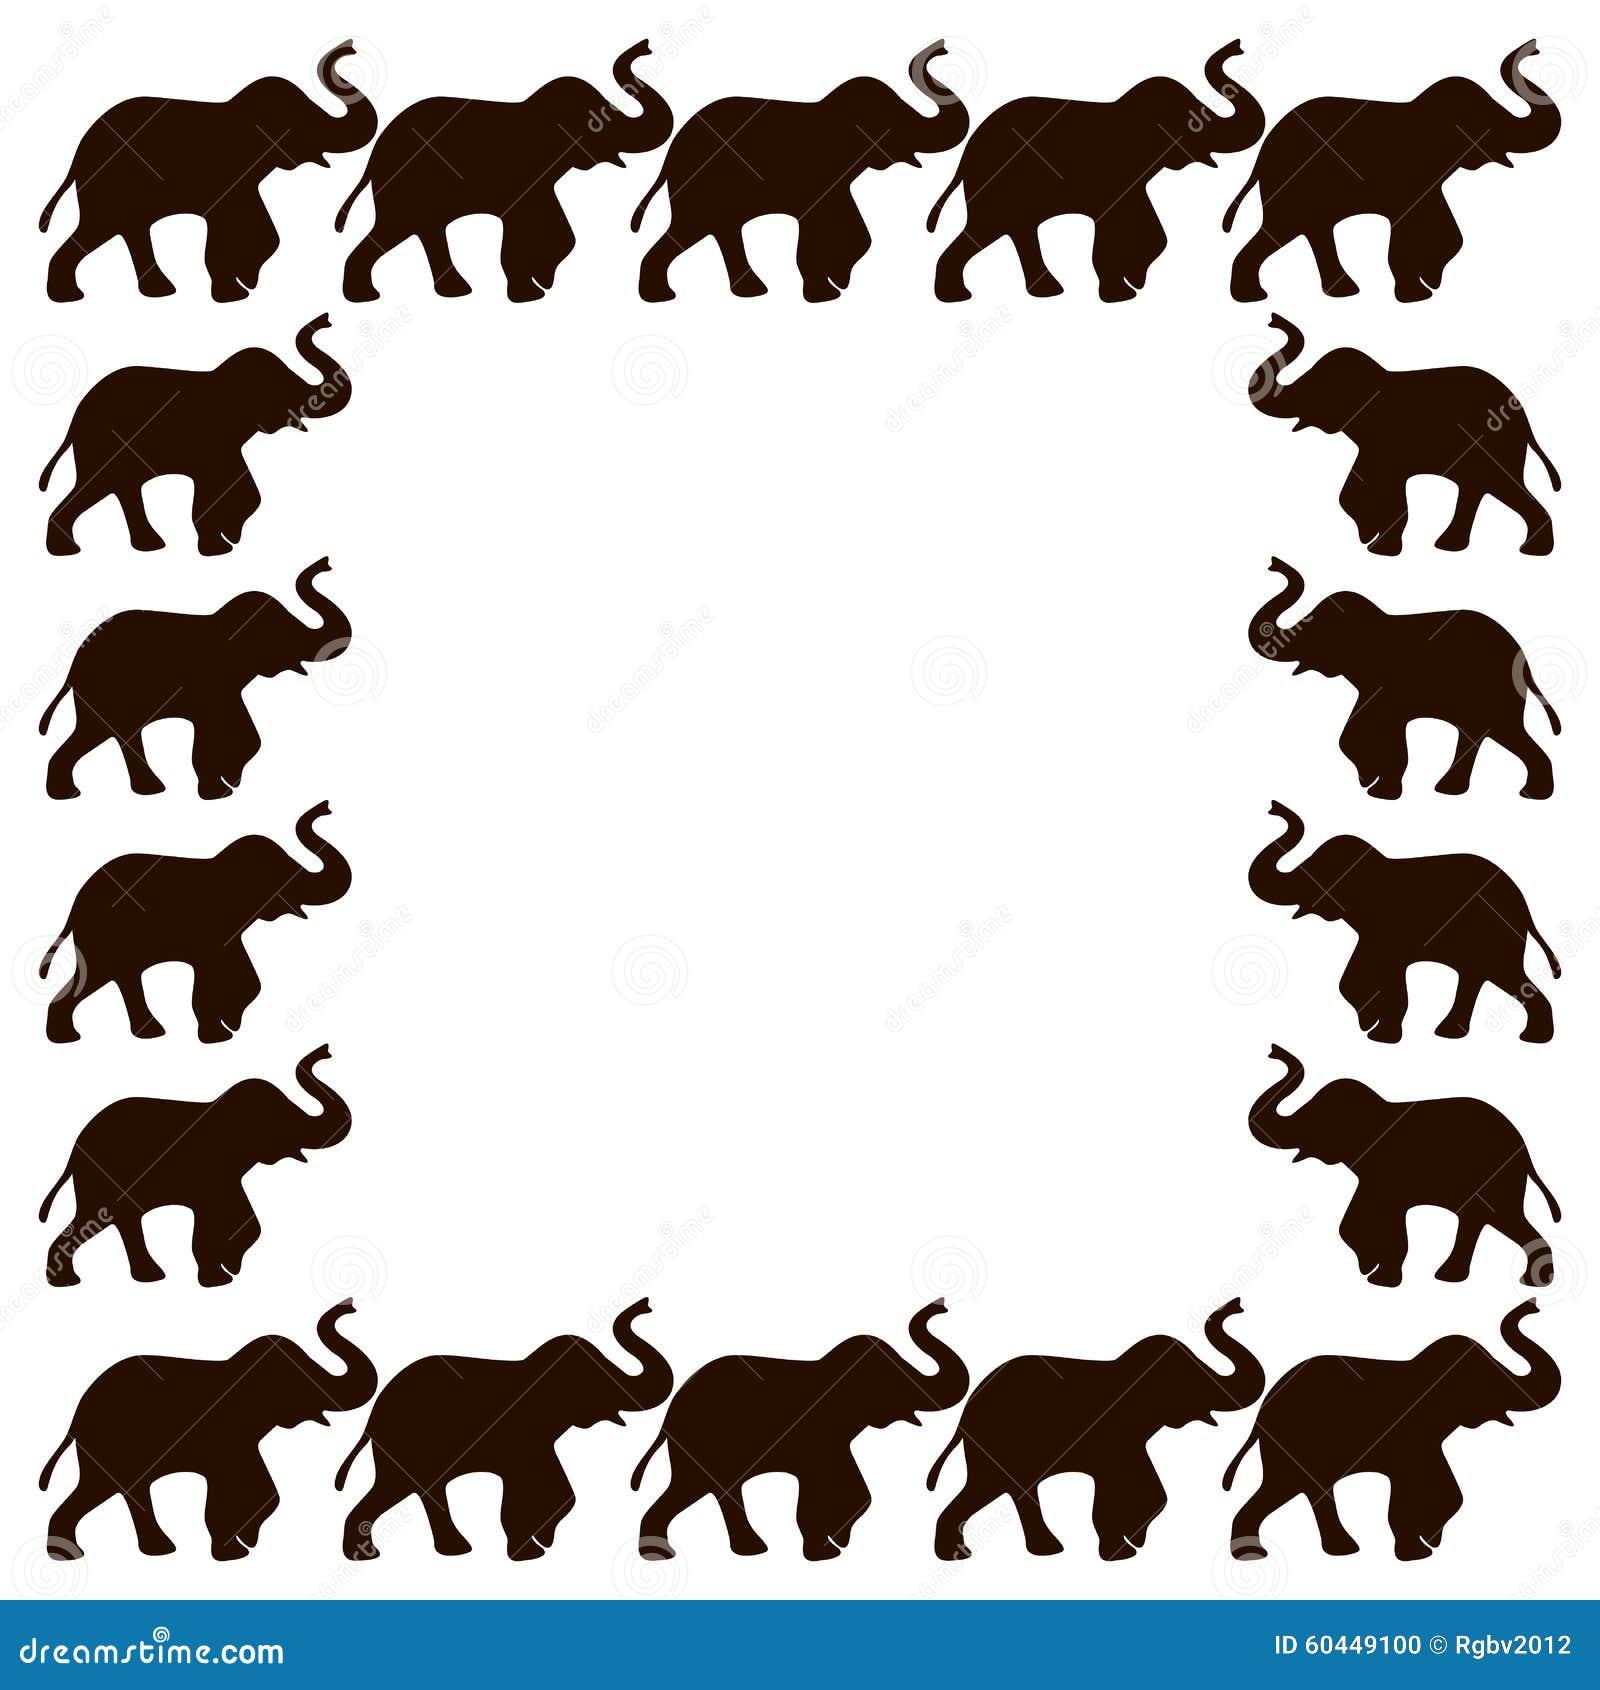 elephant frame - Elephant Picture Frame